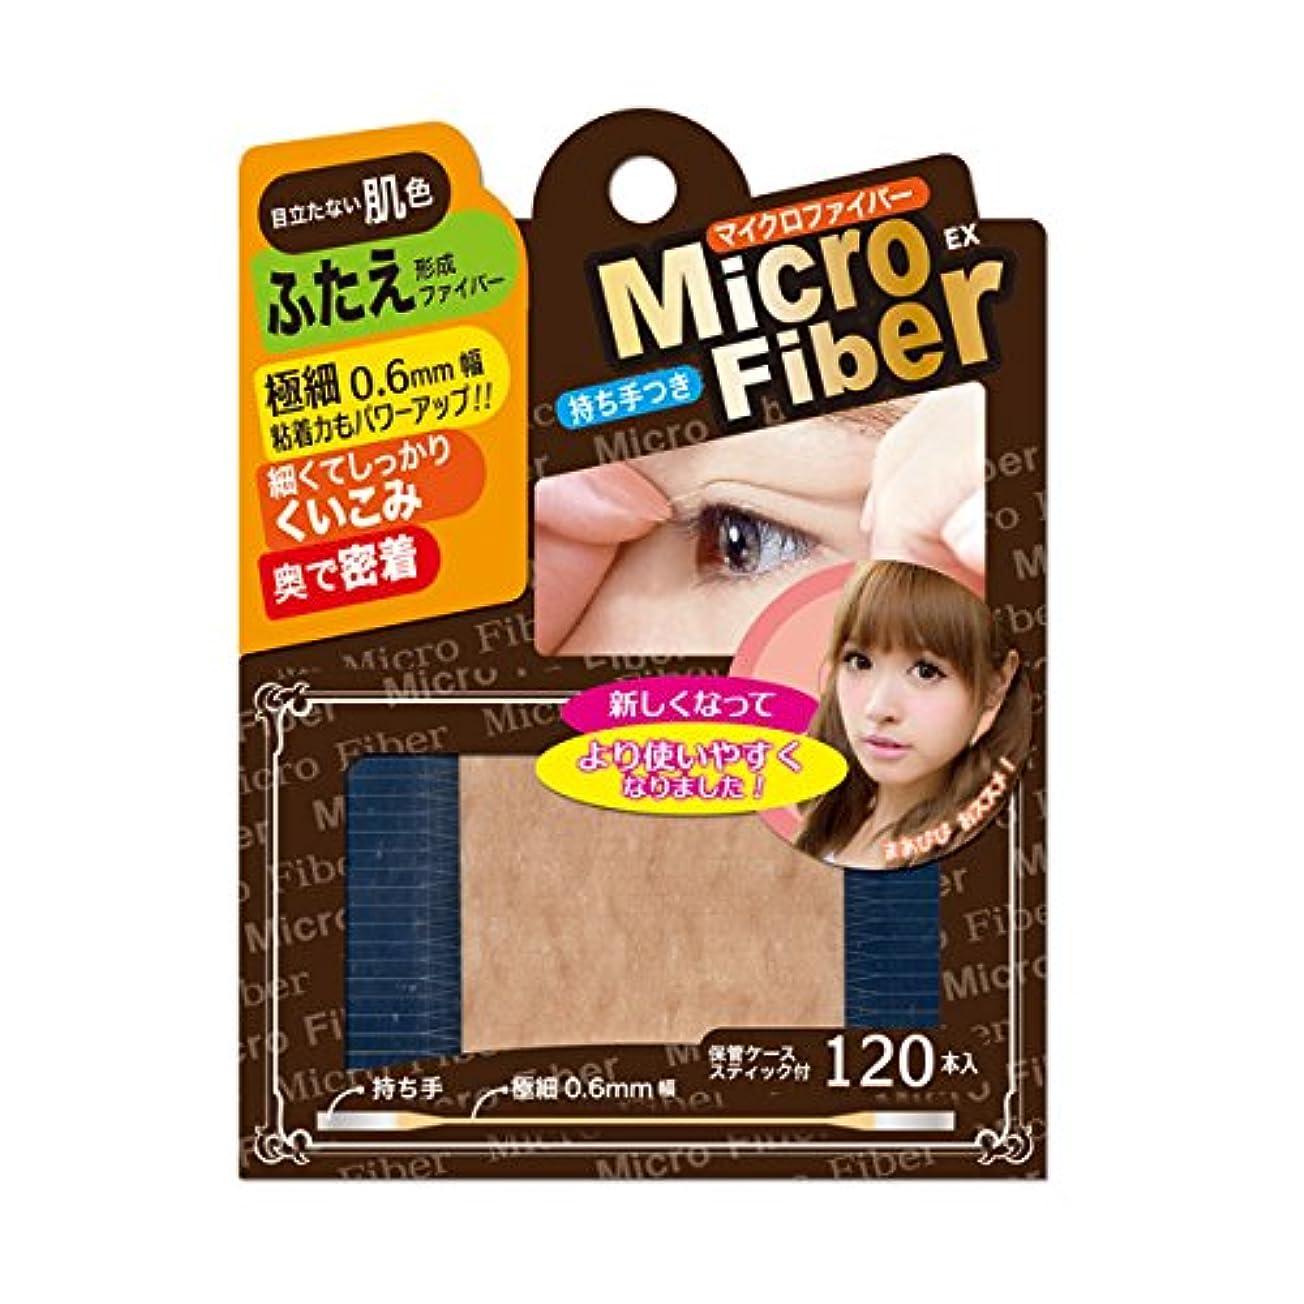 BNマイクロファイバーEX NMC-02 120本